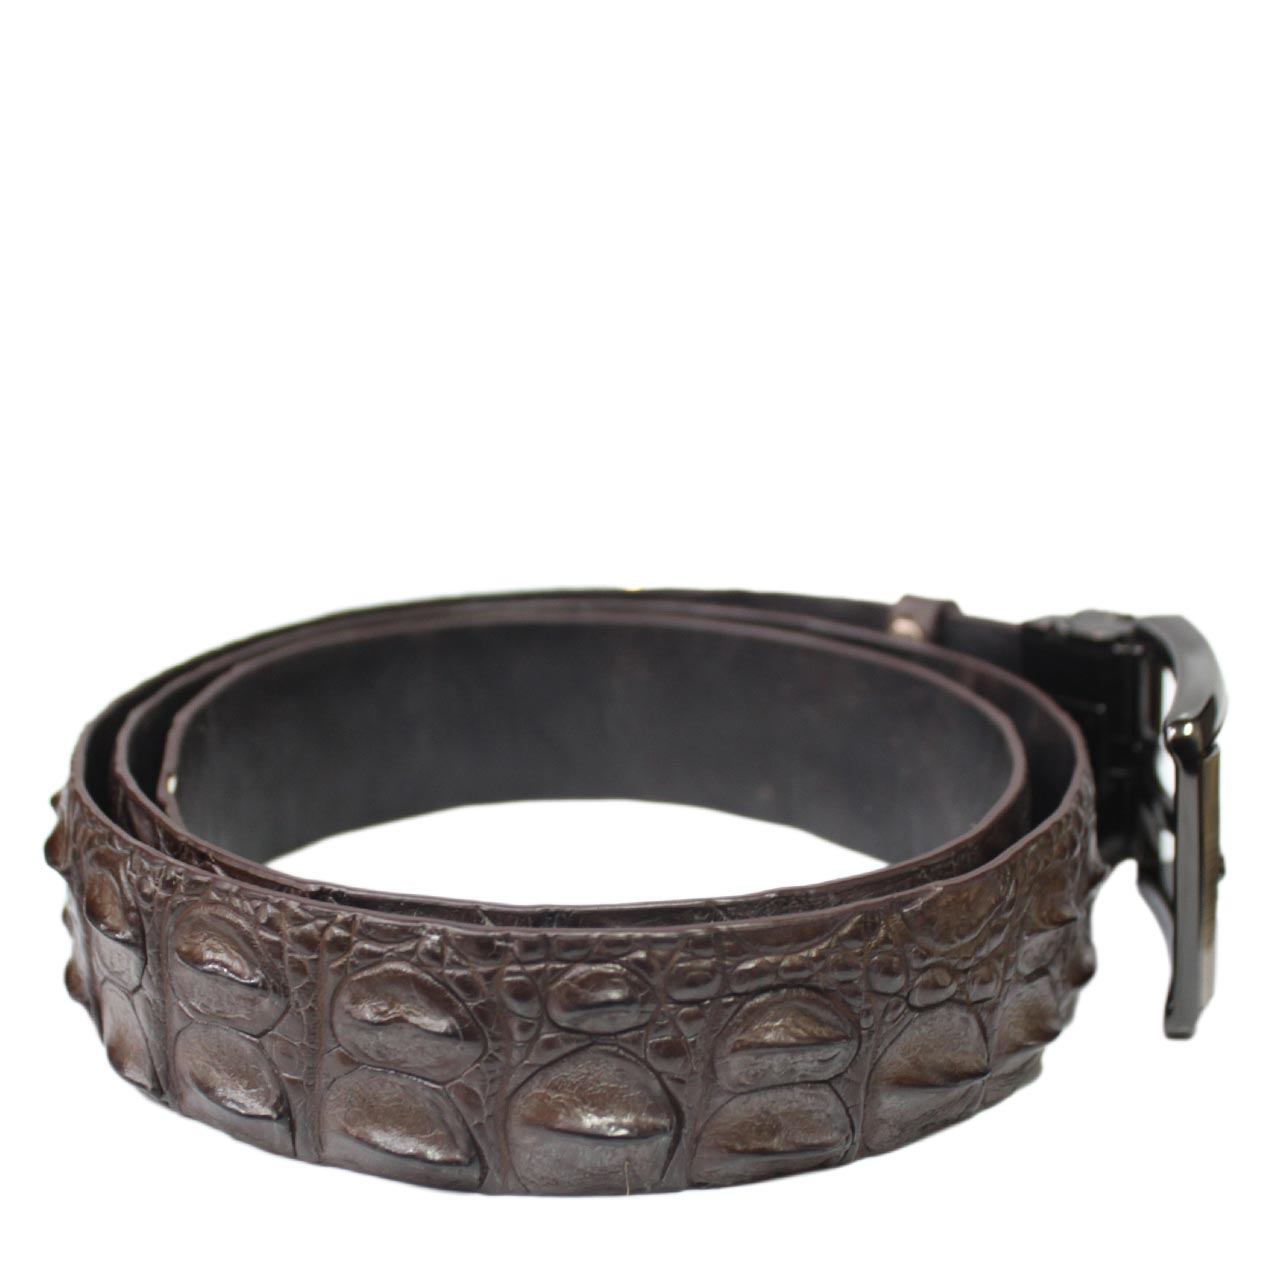 Crocodile Leather Belt S604b